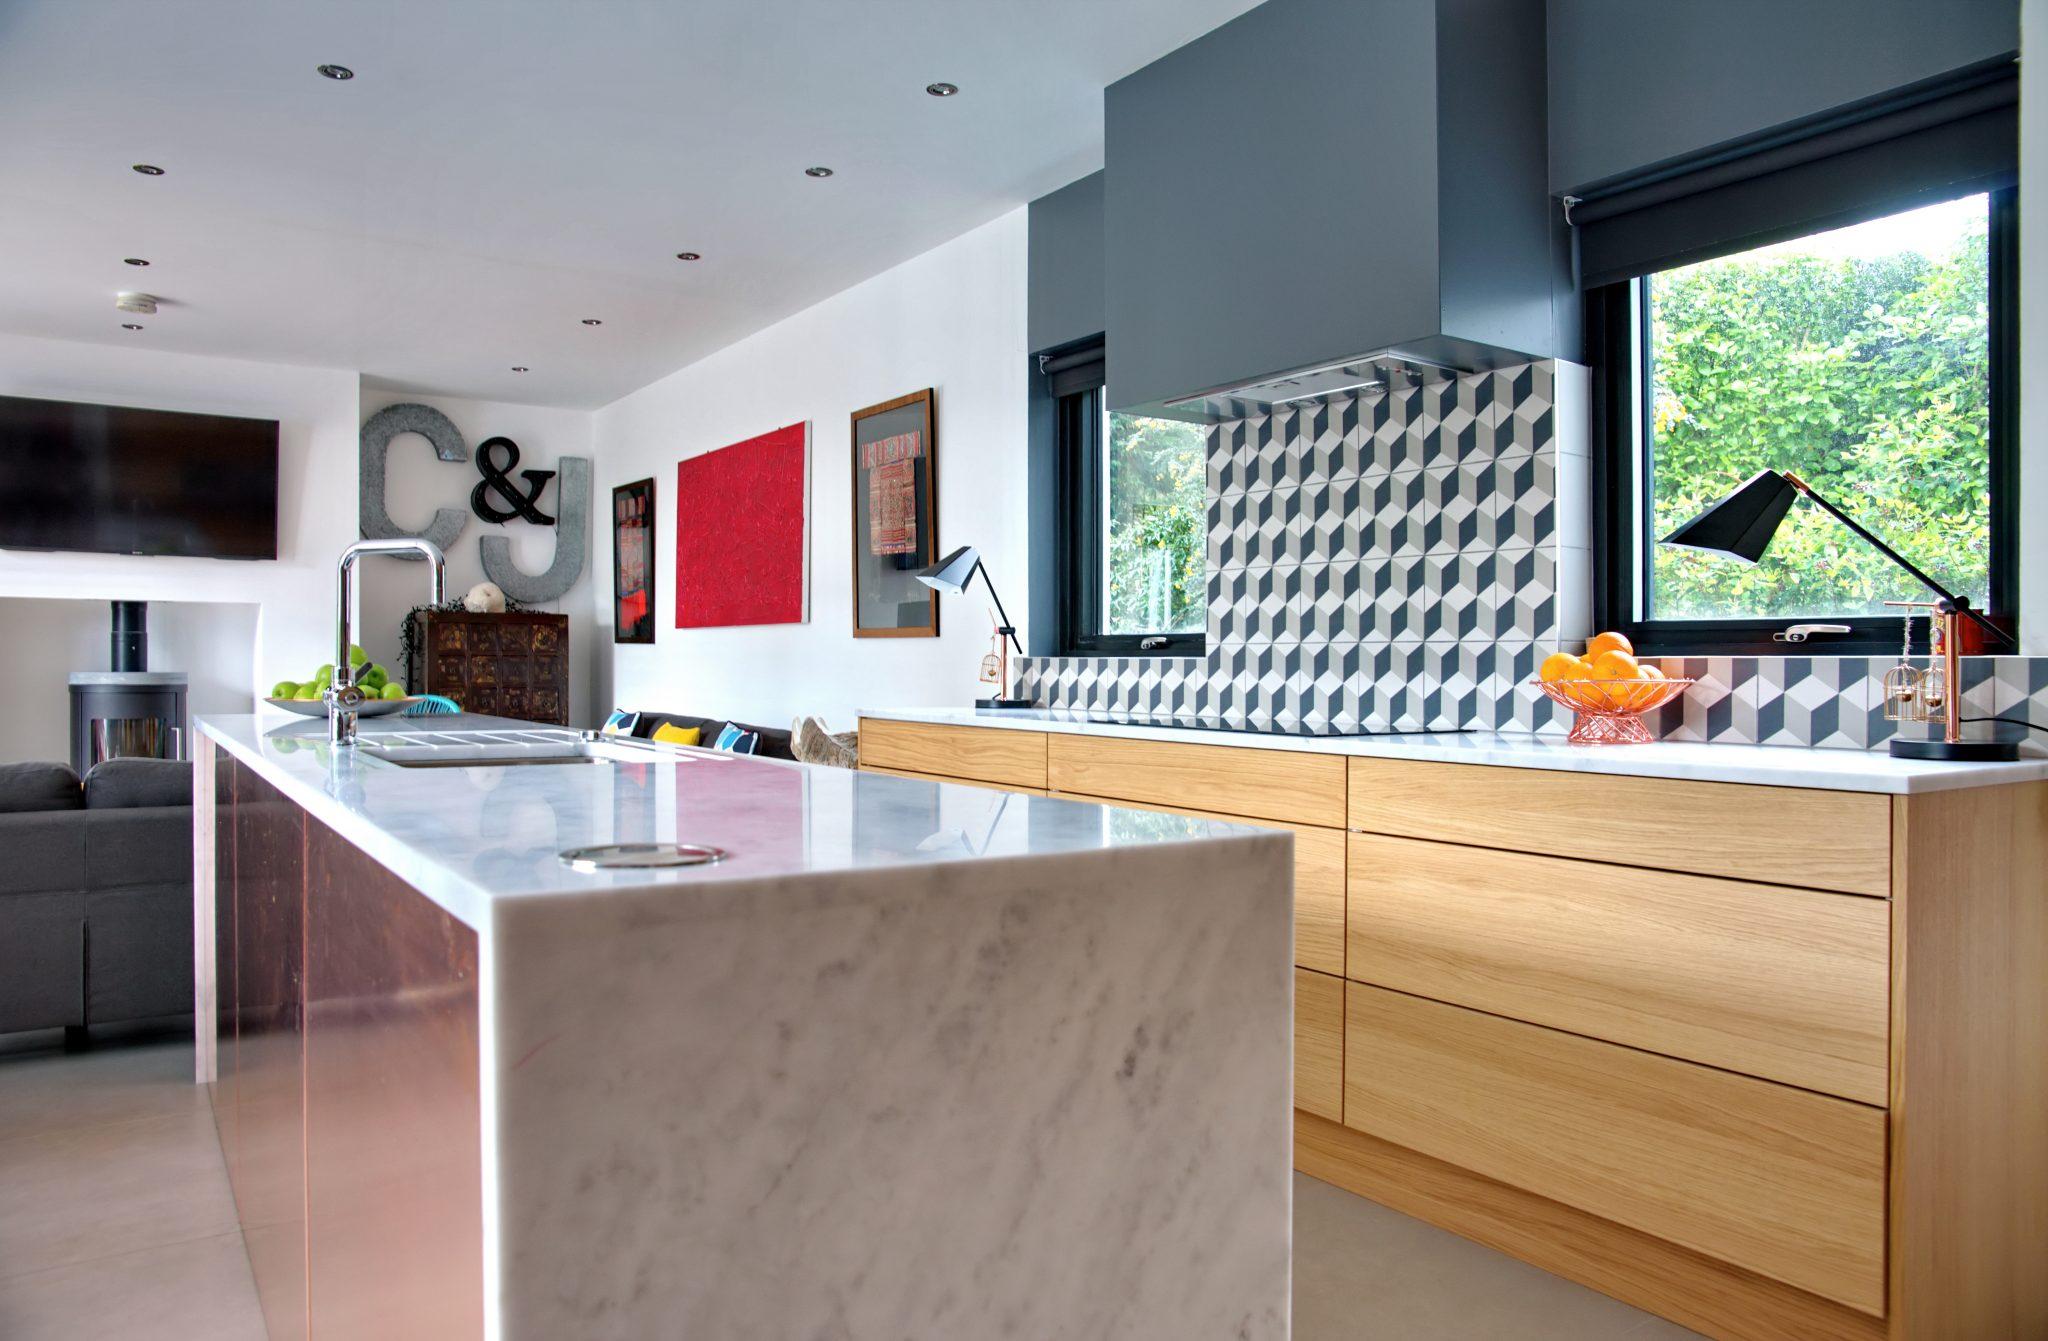 Modern Design-Adornas Kitchens-Kitchens Bangor-Kitchens Belfast-Kitchen showrooms bangor-Modern Kitchens-German Kitchens-©AdornasKitchens2017